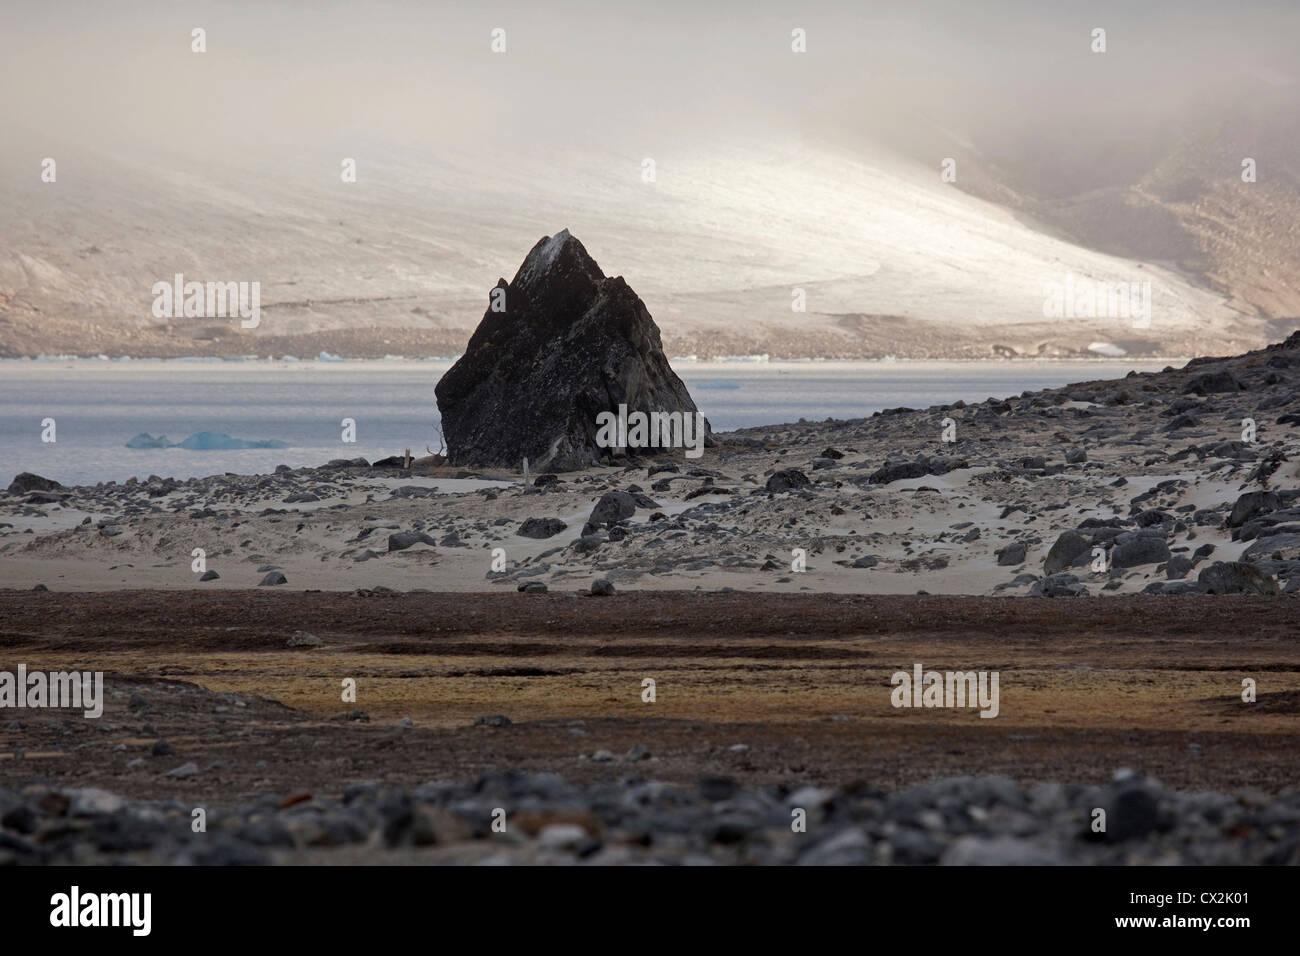 Large granite boulder on beach along the Magdalenefjord on Svalbard, Spitsbergen, Norway - Stock Image